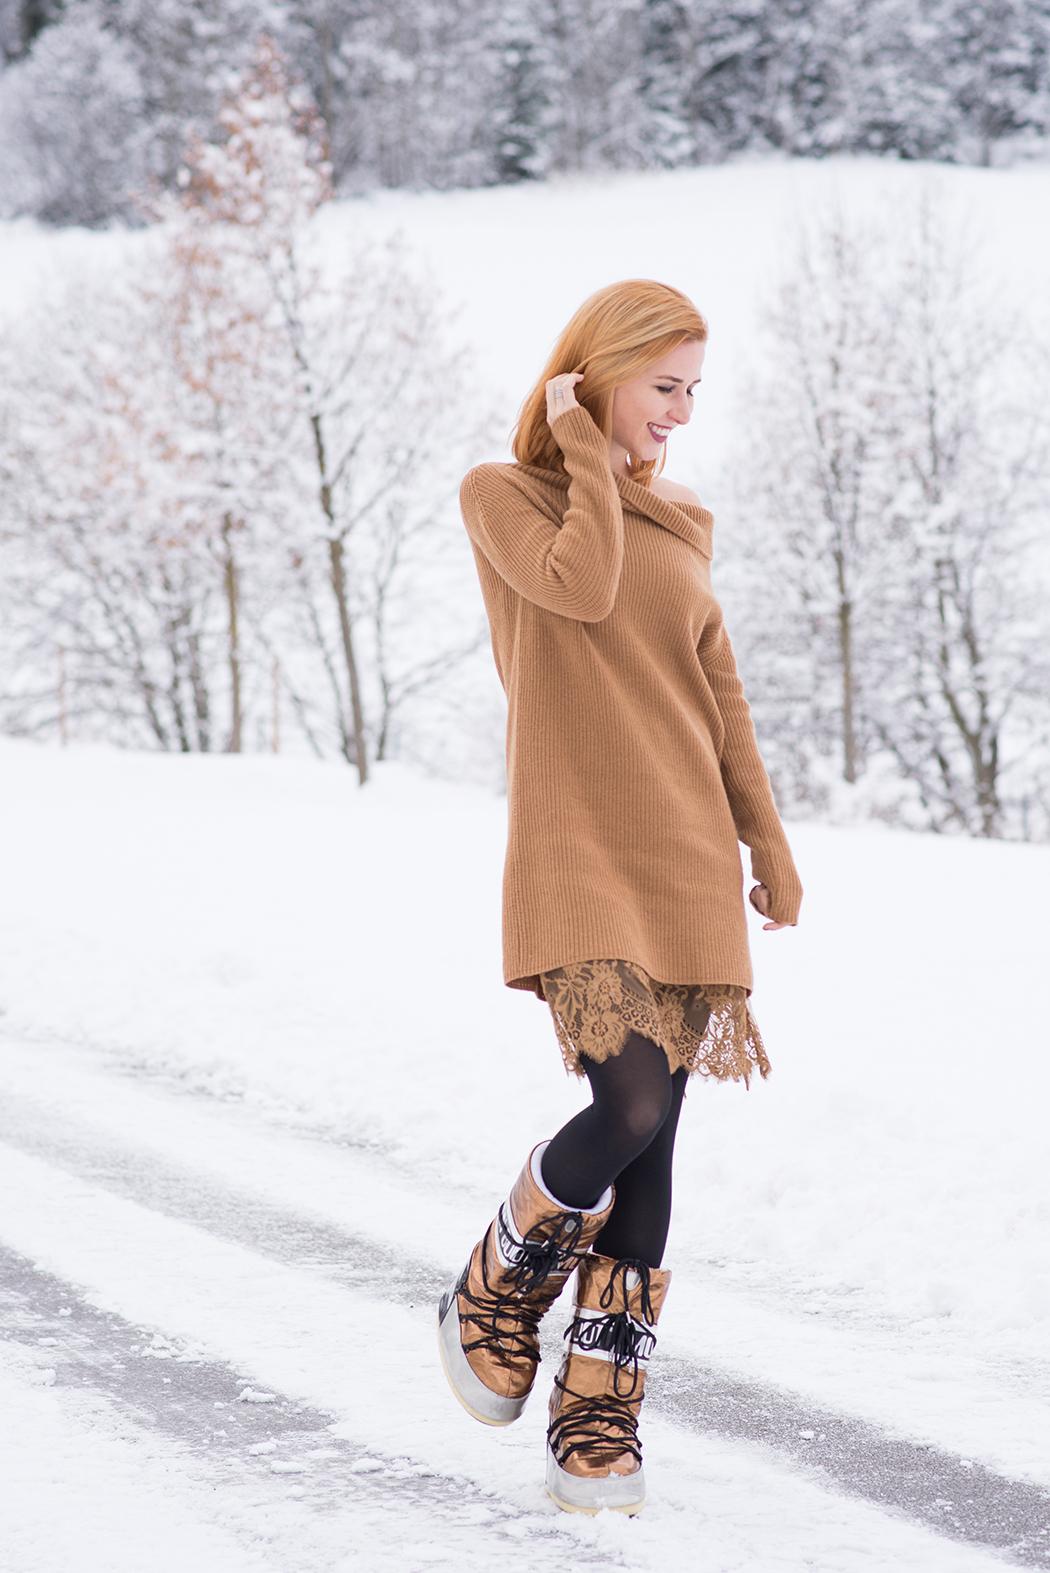 best authentic 97efc dbc2e Let it snow | Lindarella - Fashion- und Fitness Blog aus München